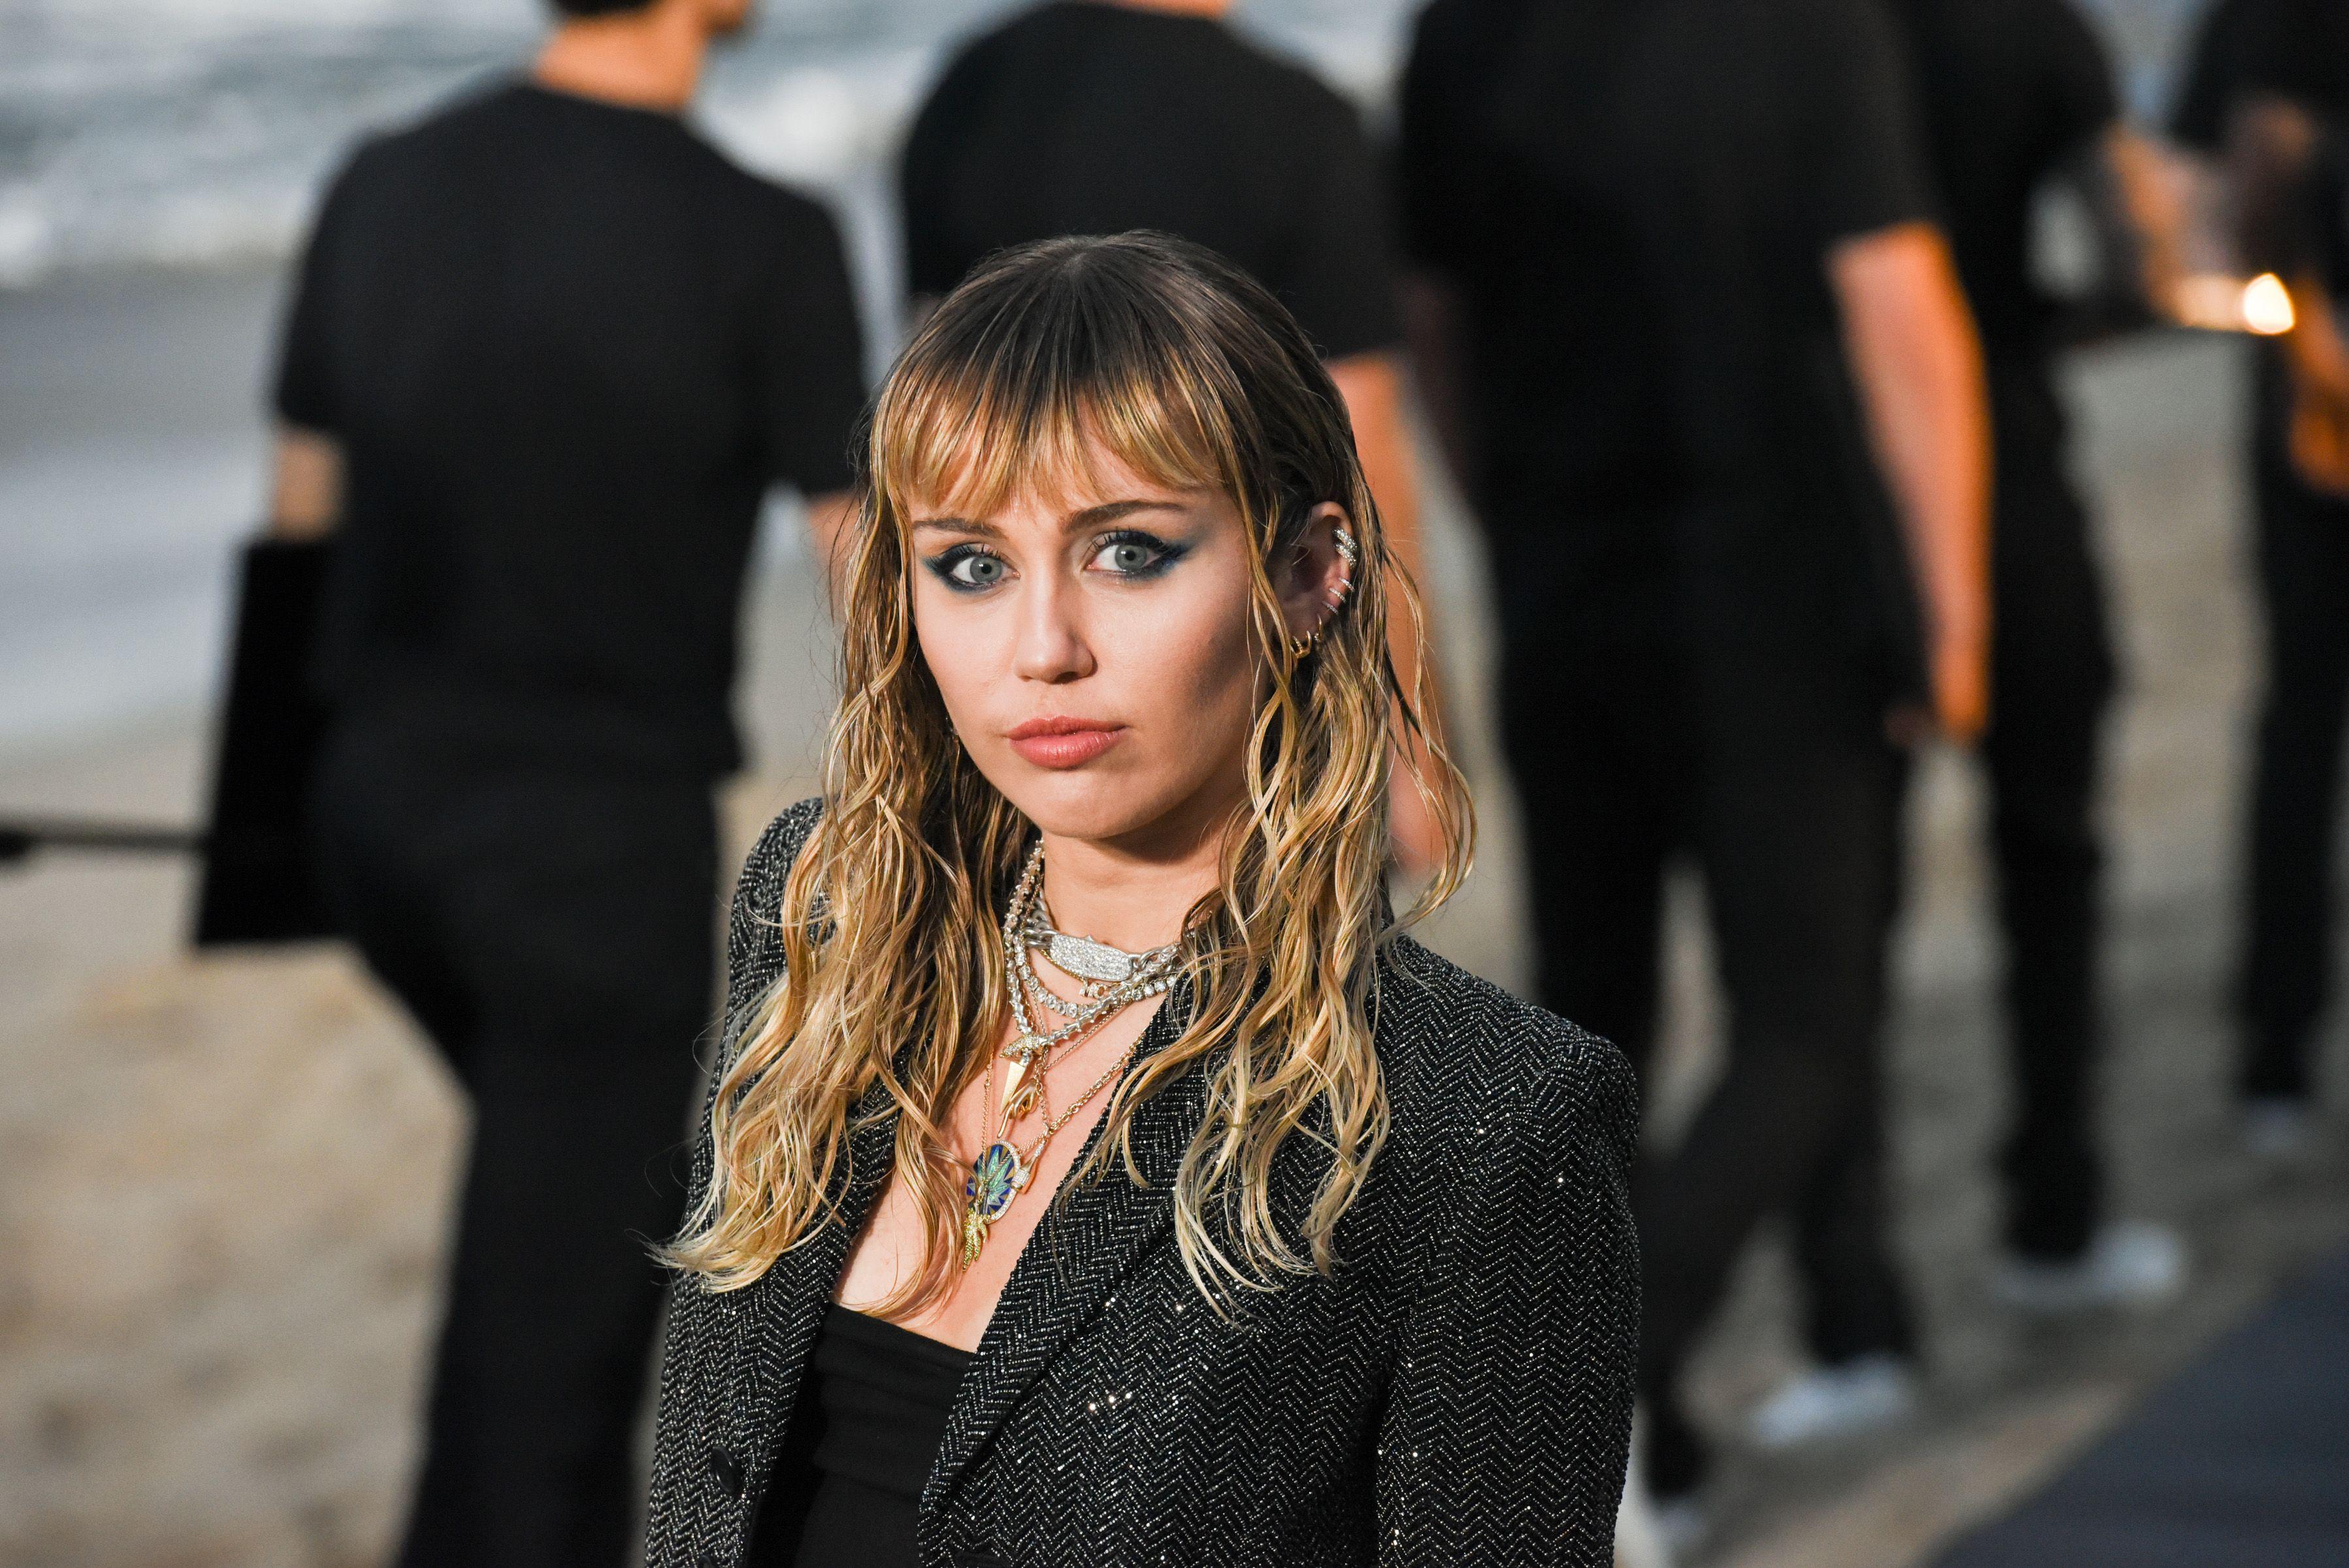 Miley Cyrus cancels bushfire aid show in Australia due to coronavirus warnings